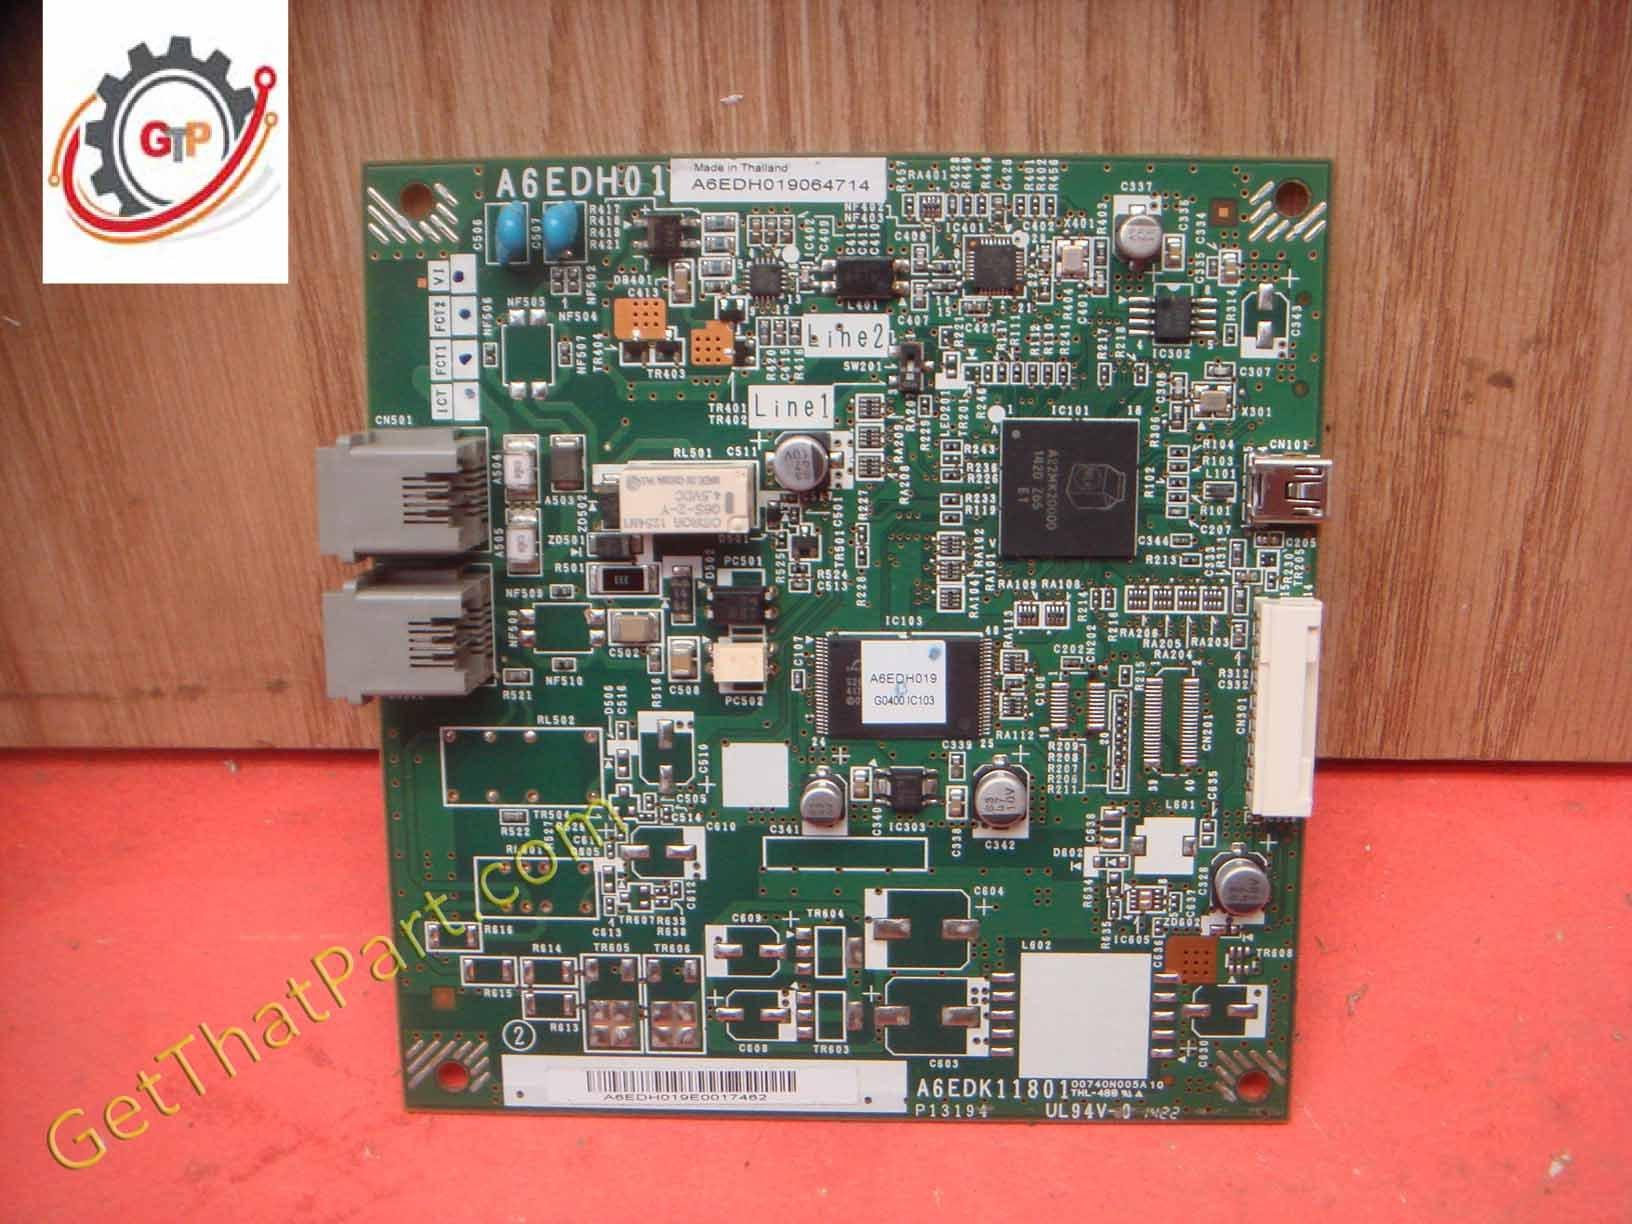 Genuine Konica Minolta FK-512 Fax Kit A6EDW11 C3350 C4050 C4750